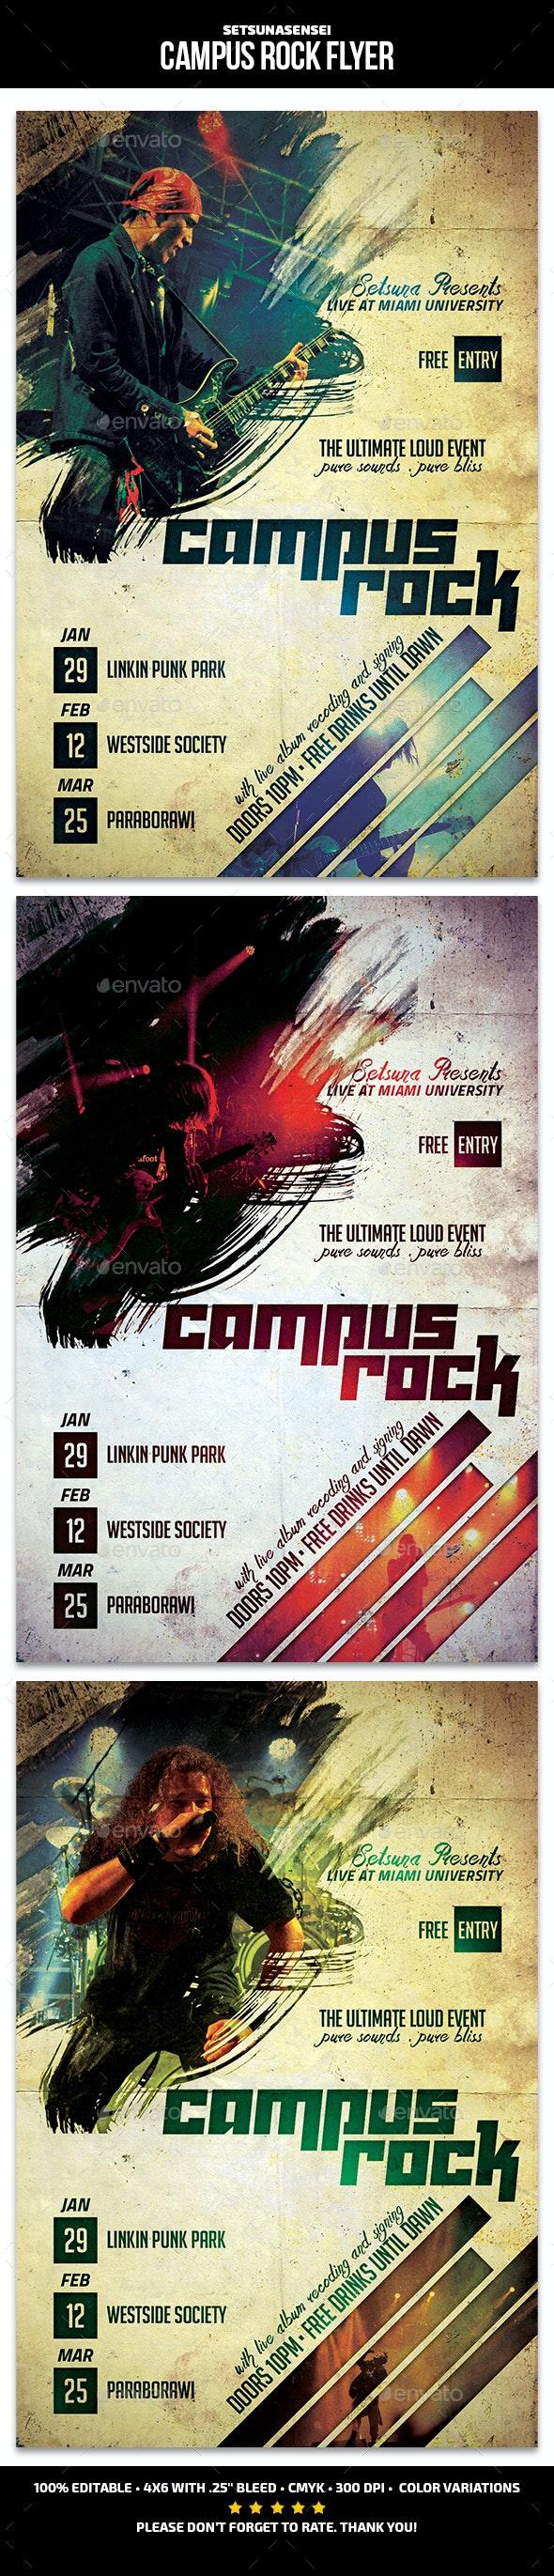 Campus Rock Flyer - Concerts Events